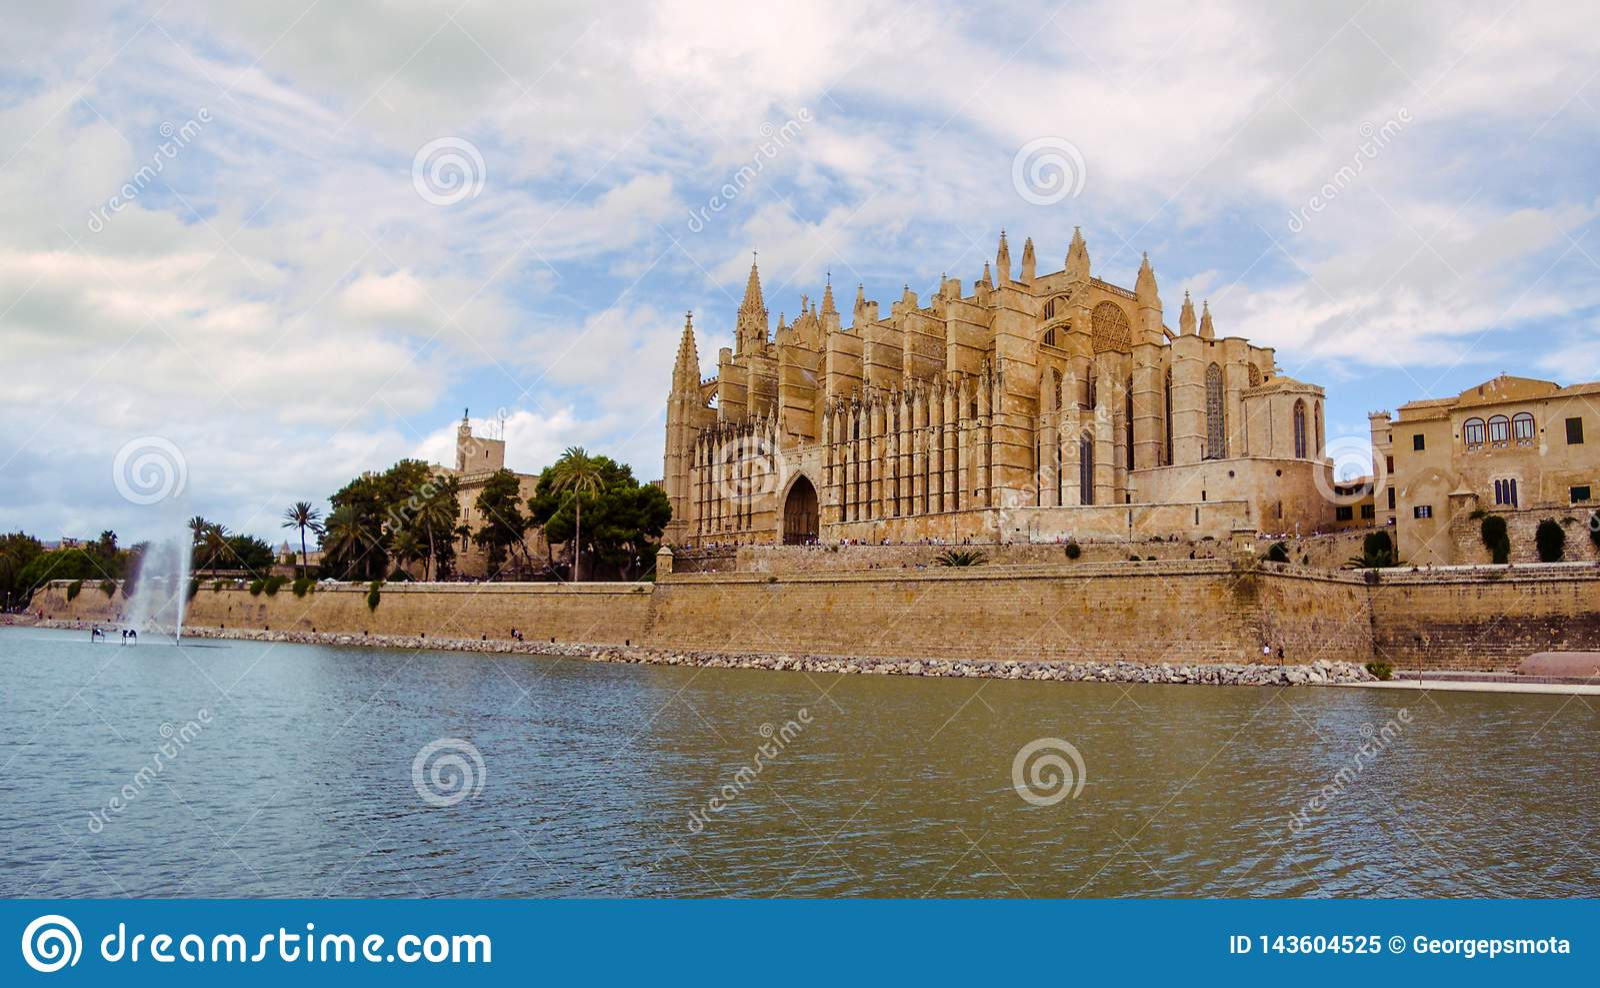 La famoso Seu da catedral em Palma de Mallorca, Espanha